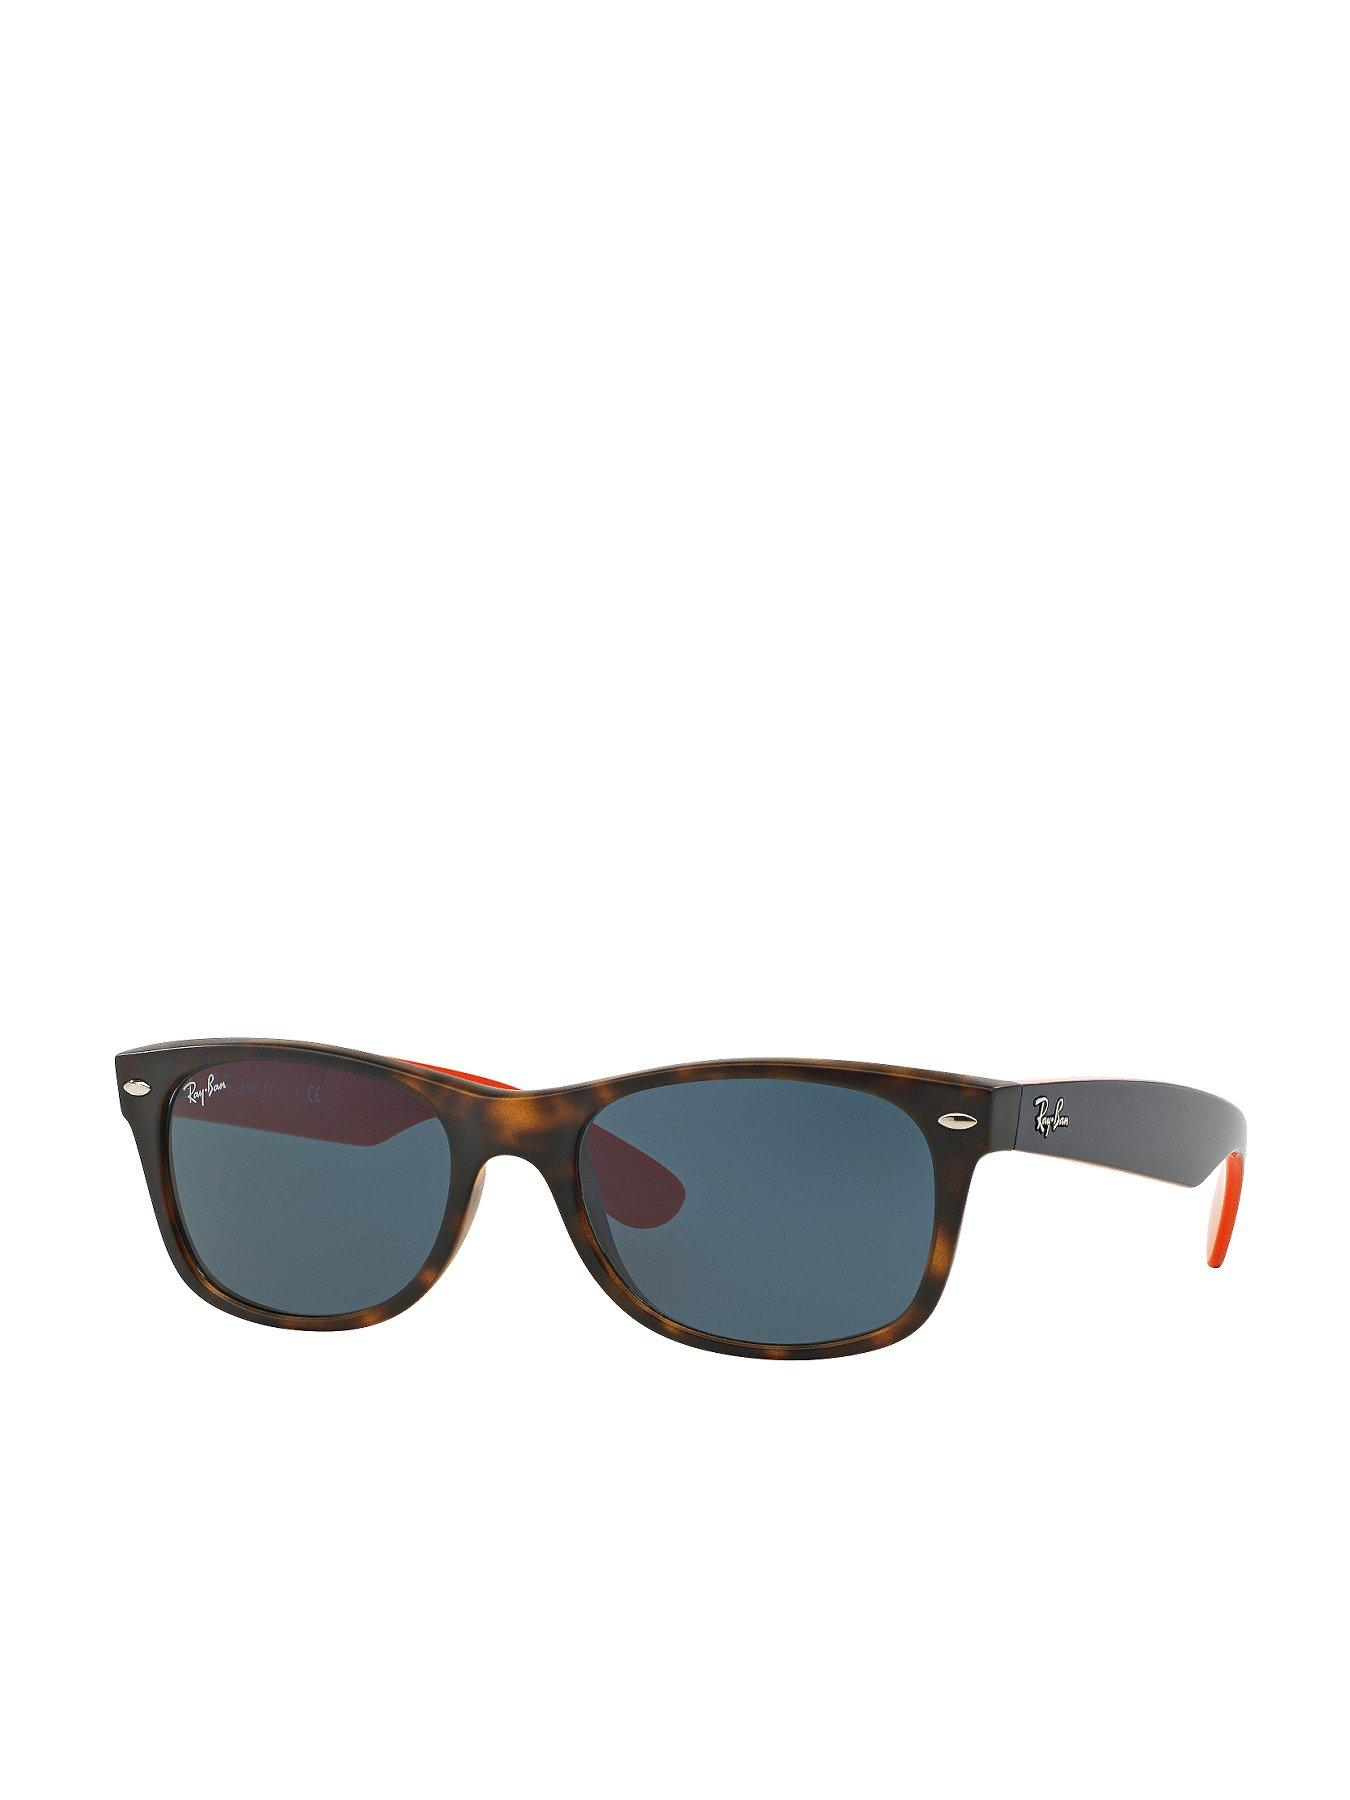 Ray-Ban Womens Sunglasses